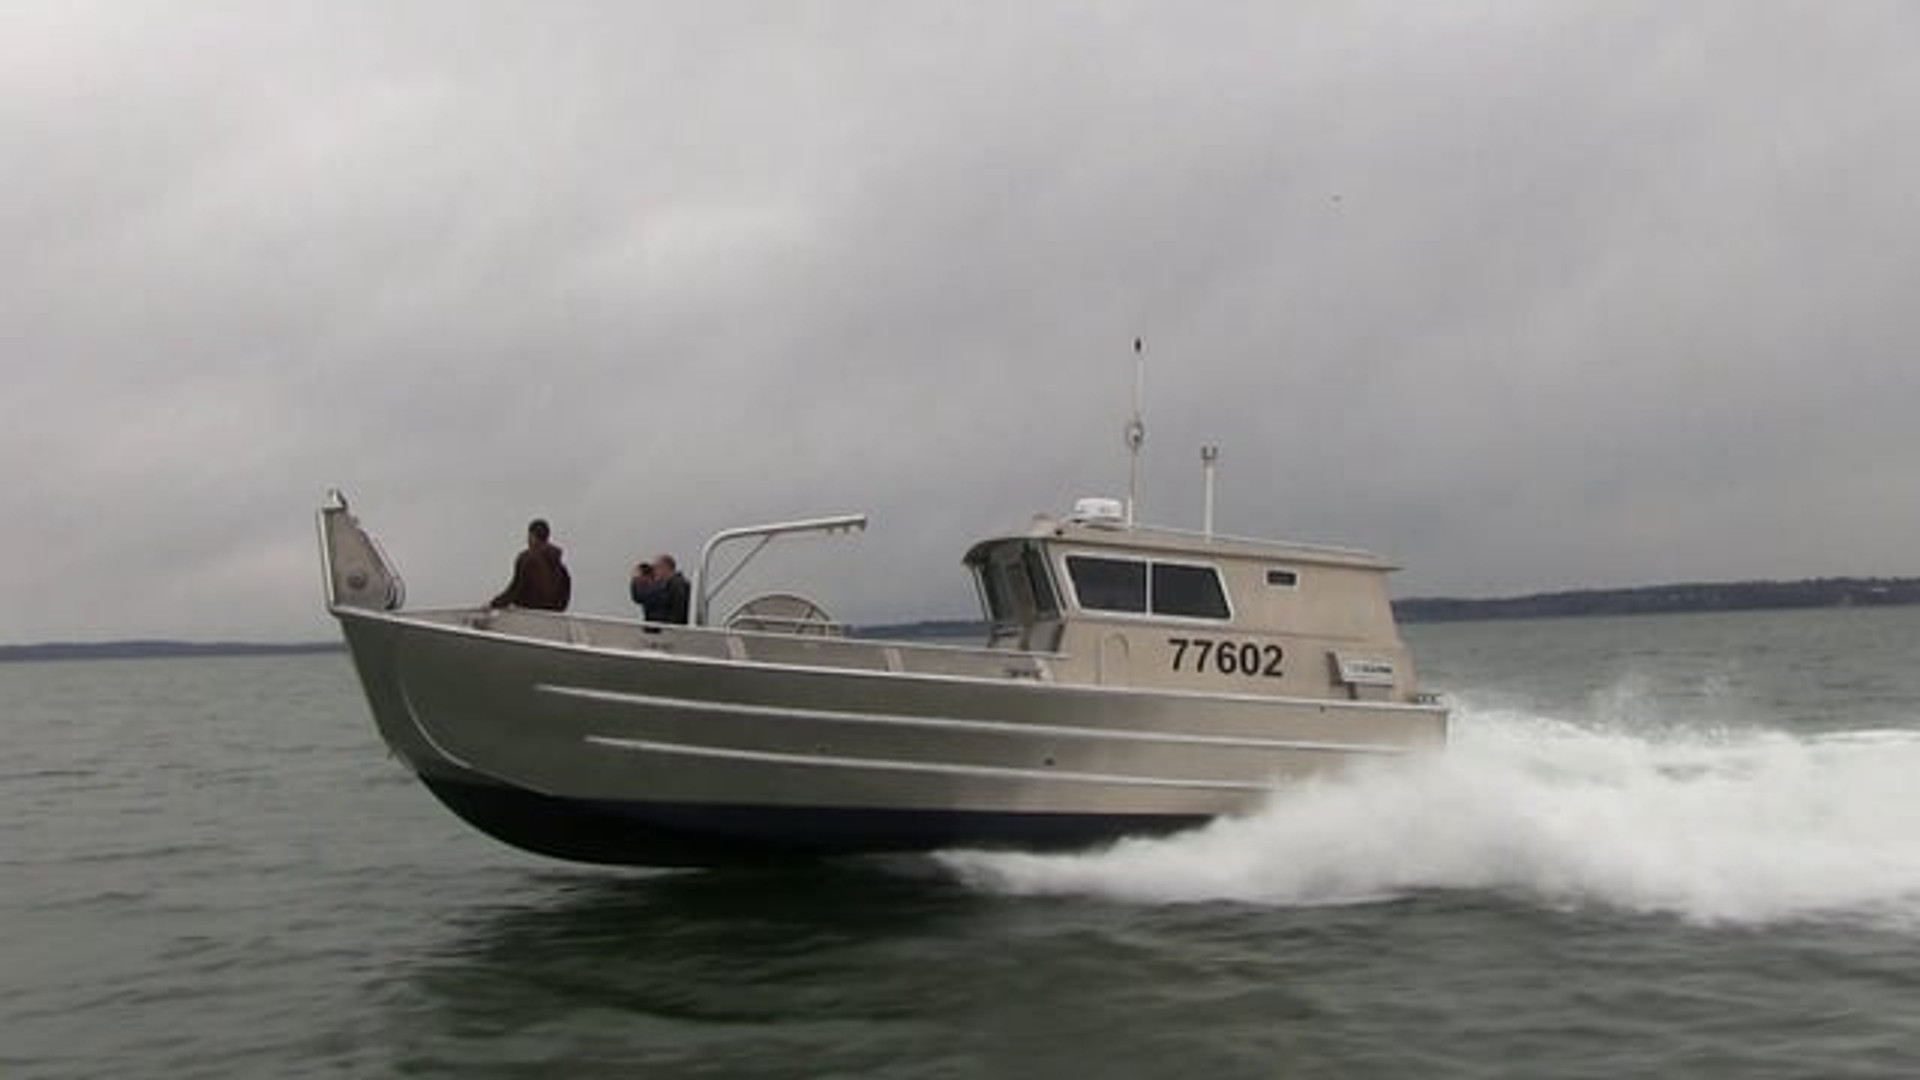 Crown Royal Fishing Boat